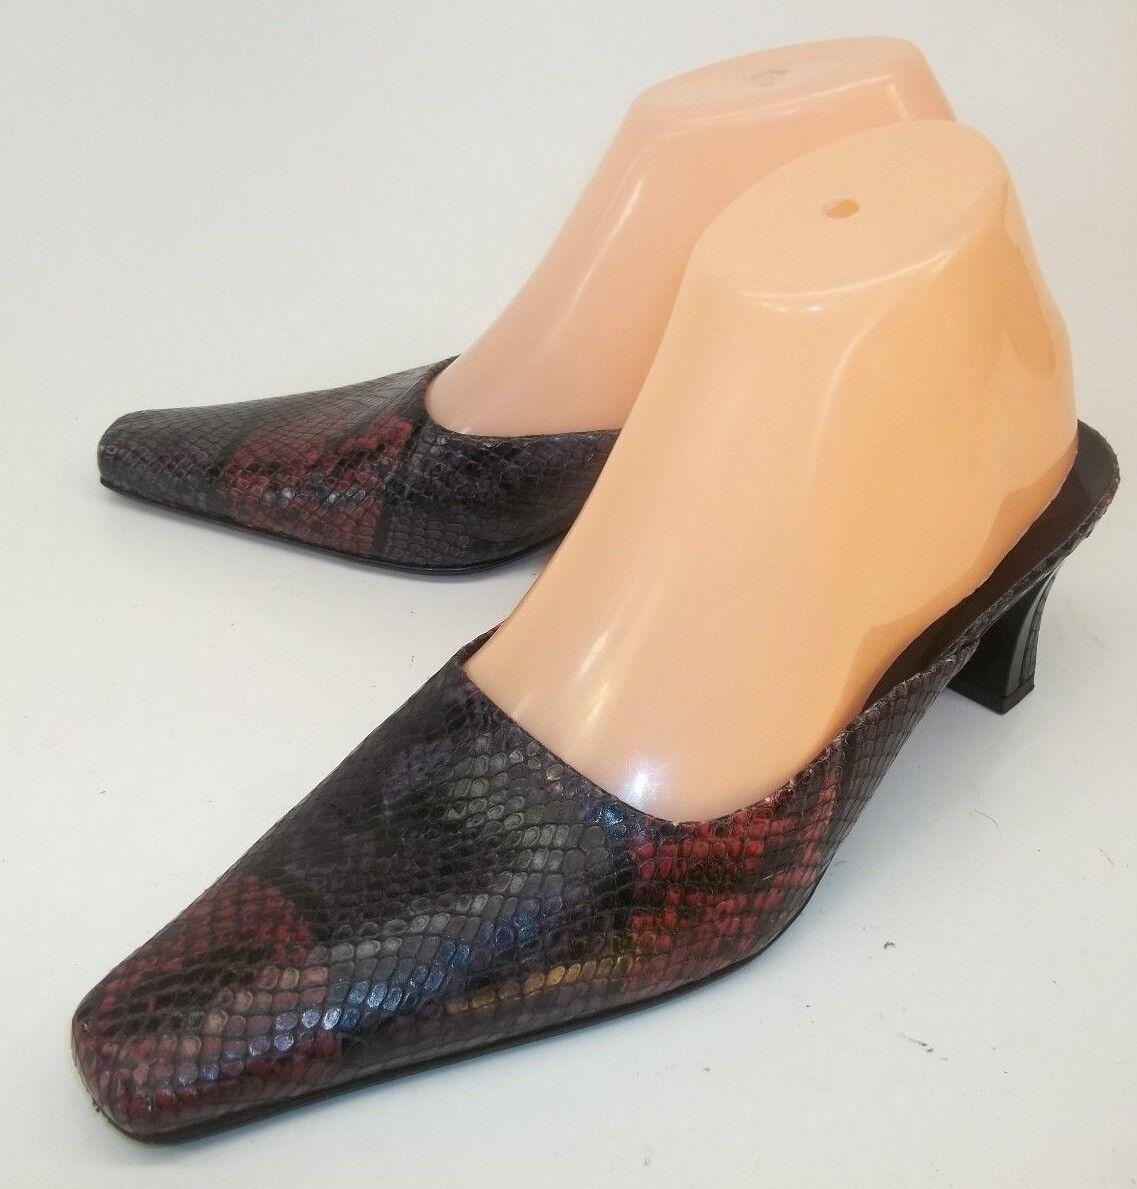 Via Spiga Damenschuhe Schuhes Mules Heels US7M Multi-color Snake Emboss Leder